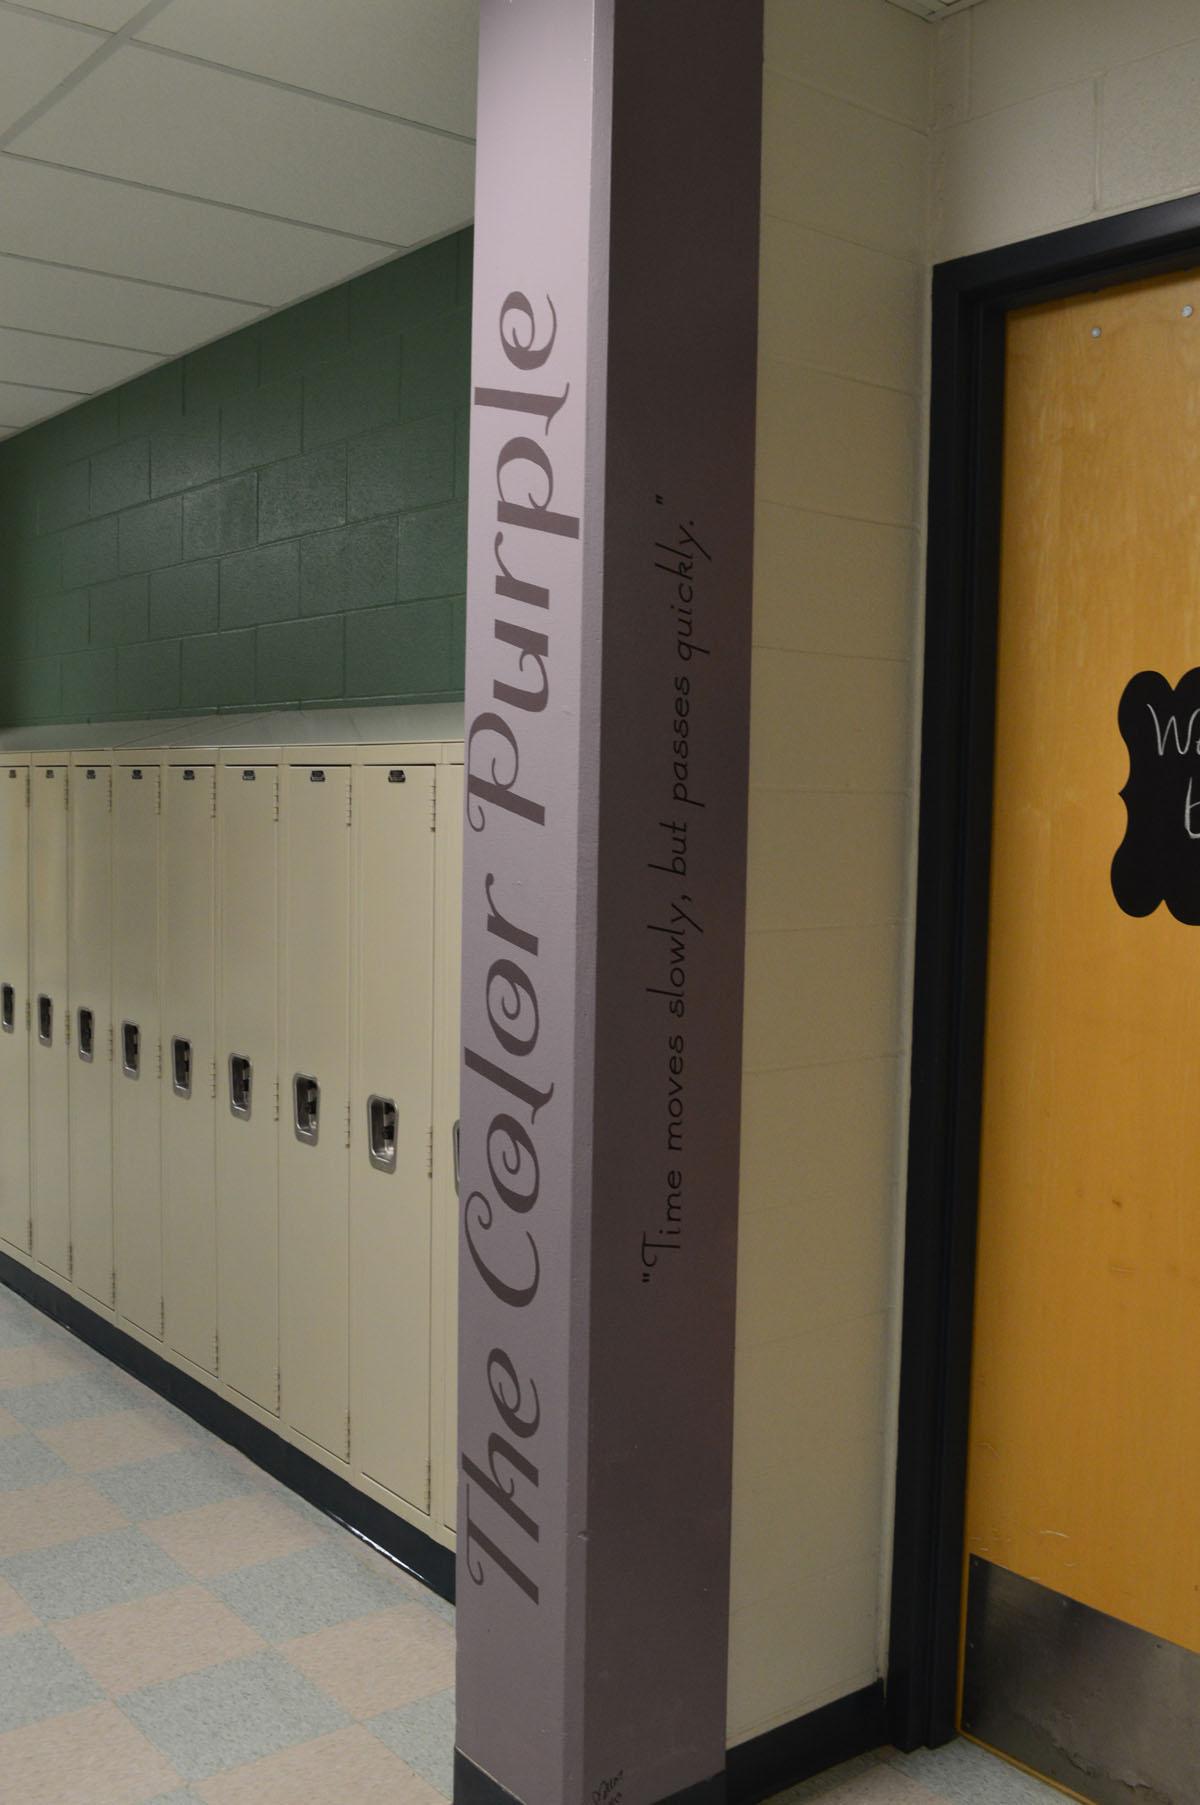 The Color Purple mural